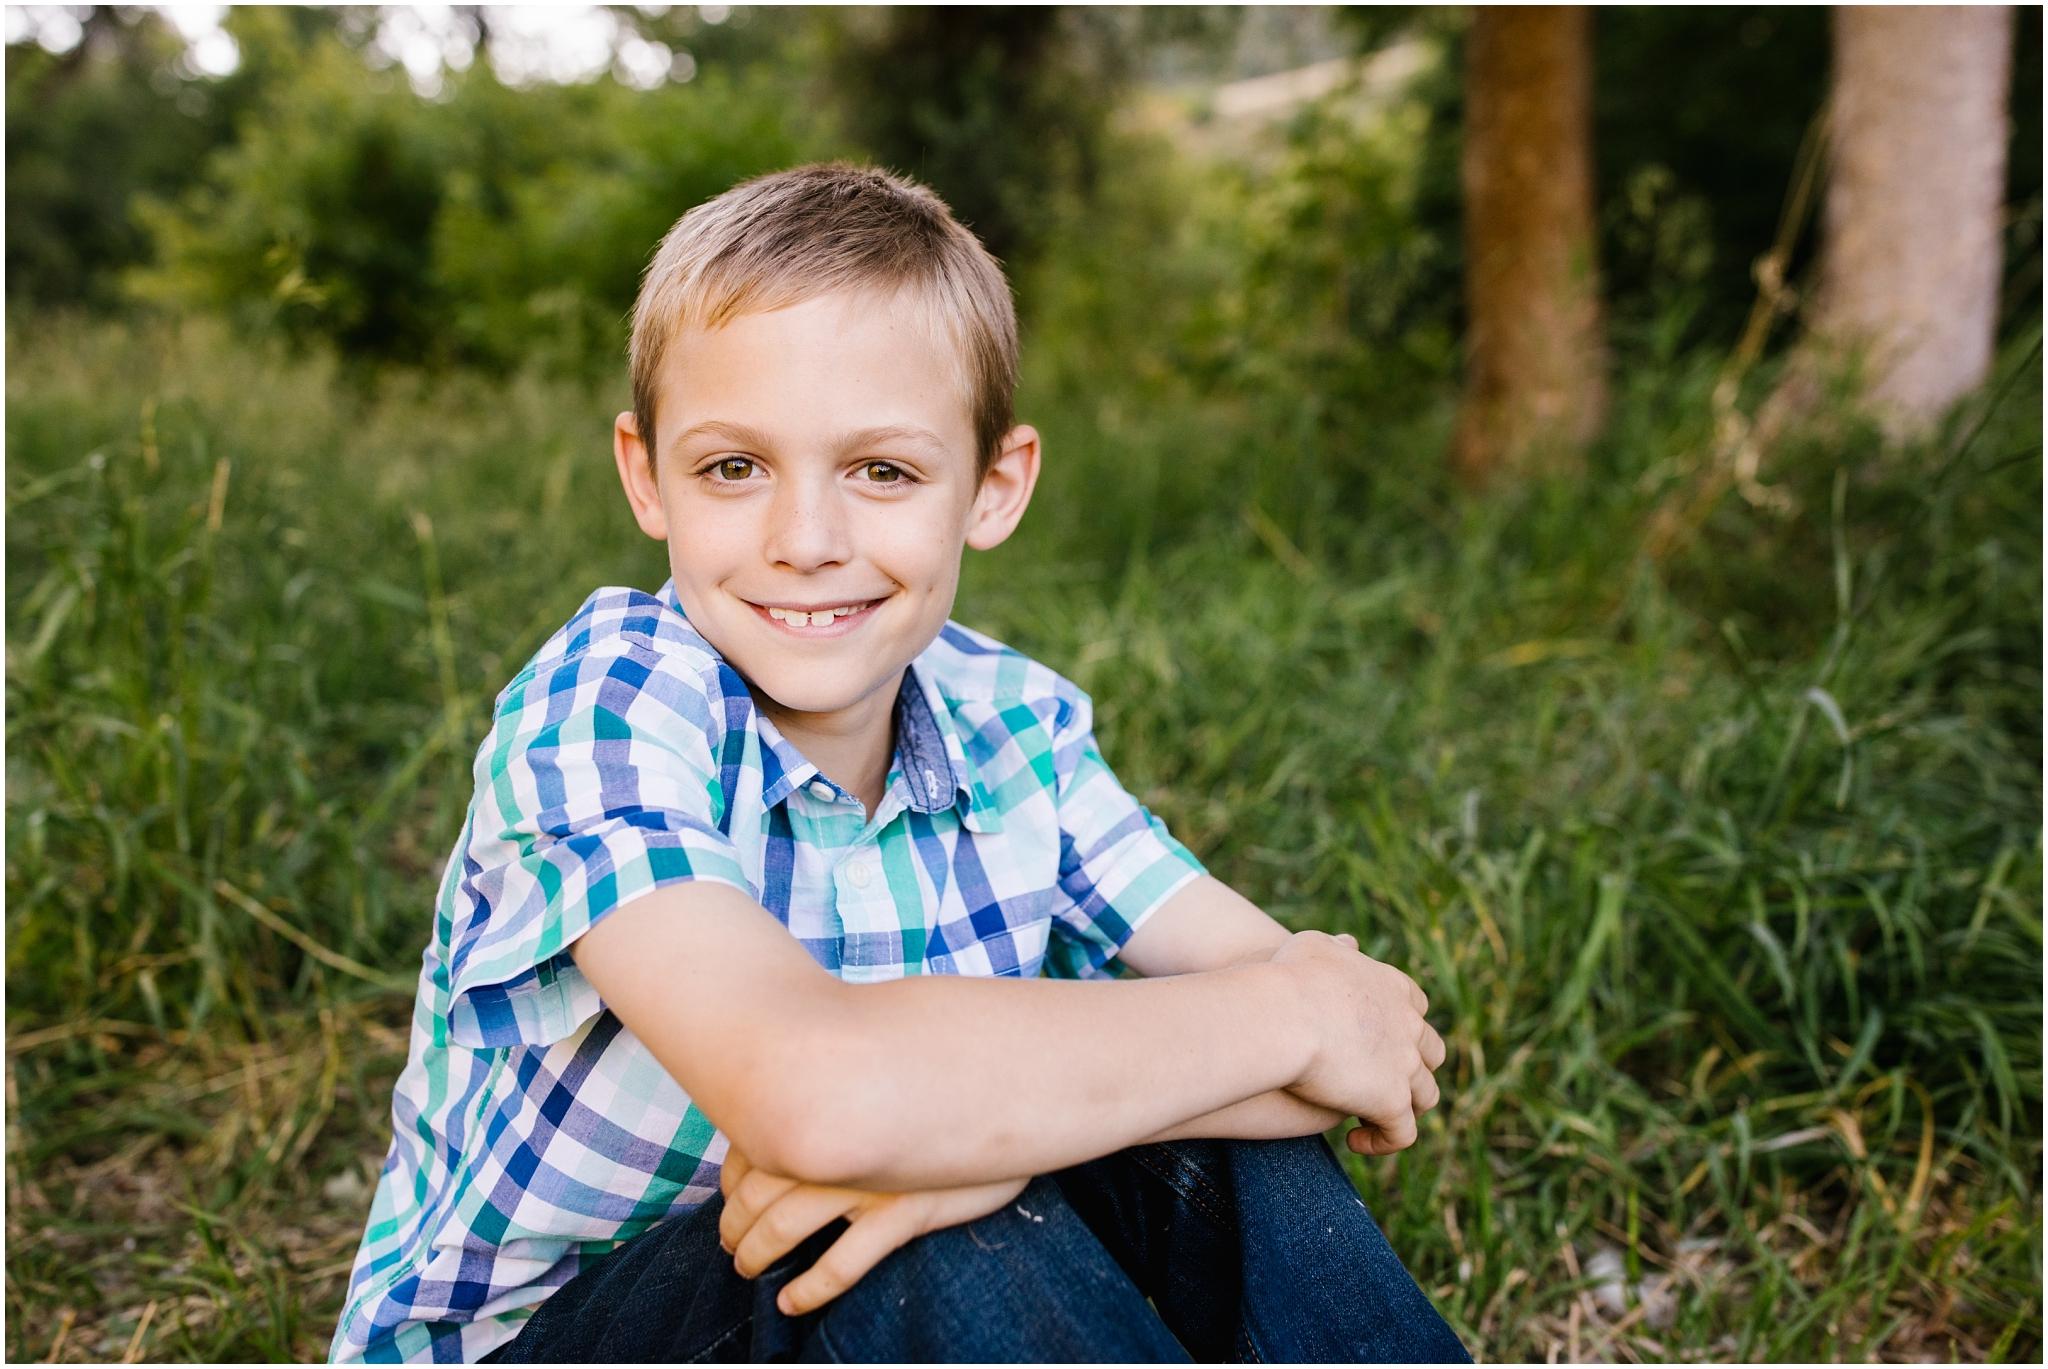 Lizzie-B-Imagery-Utah-Family-Photographer-Utah-County-Photographer-Hobble-Creek-Canyon_0013.jpg